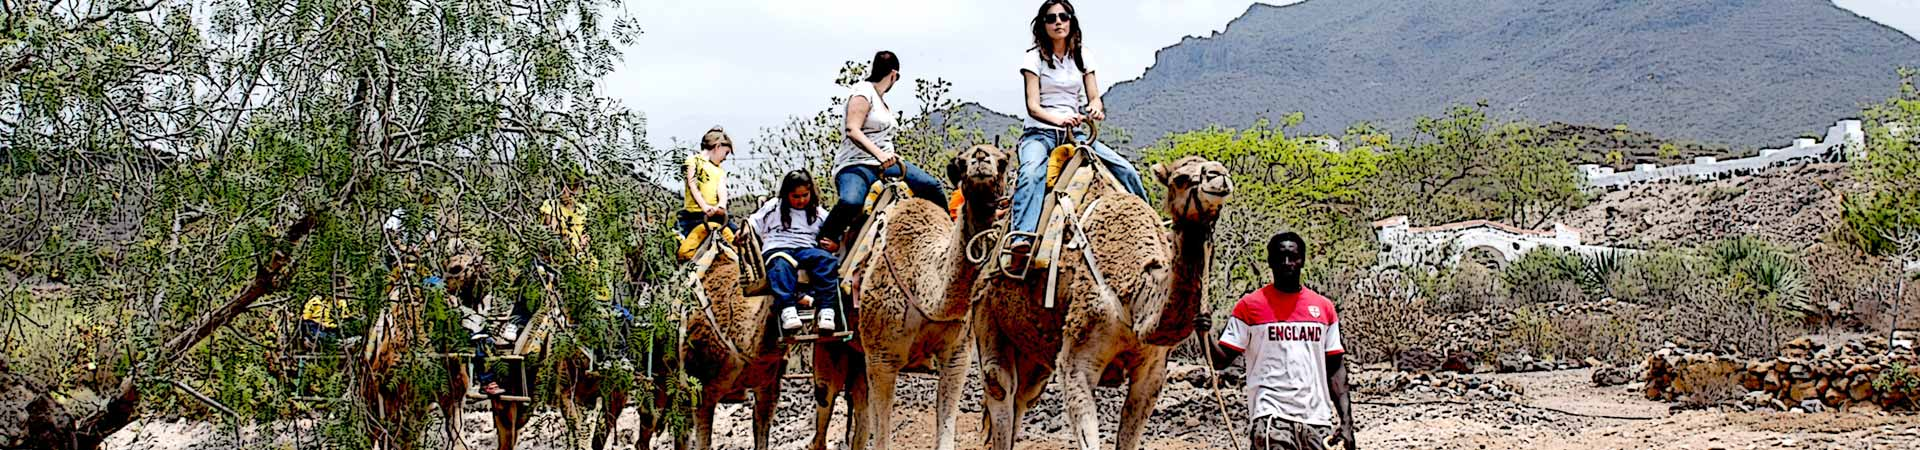 https://www.goodmorningtenerife.com/wp-content/uploads/2015/07/03_slide_camel-park-1920x450-1.jpg